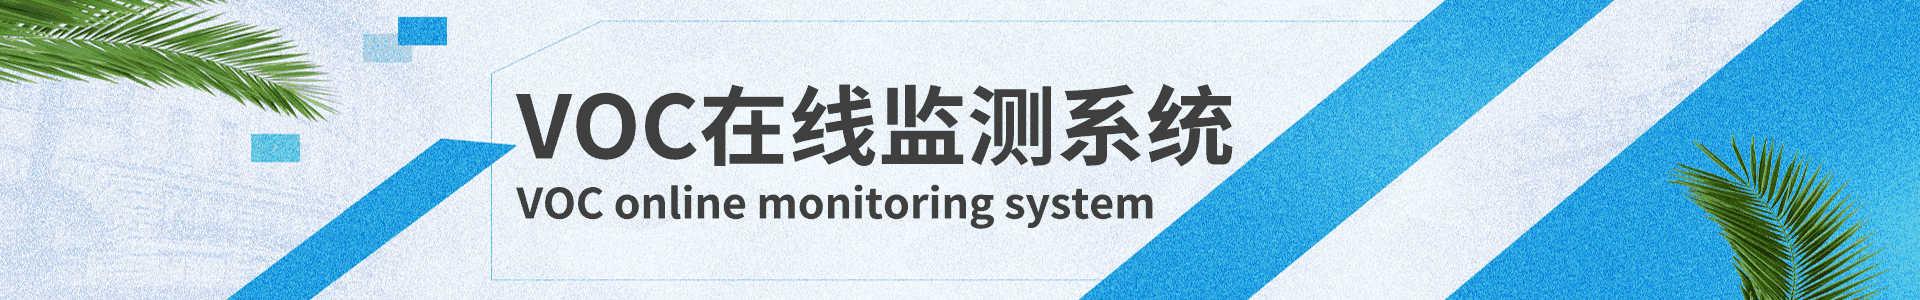 voc在线监测系统banner